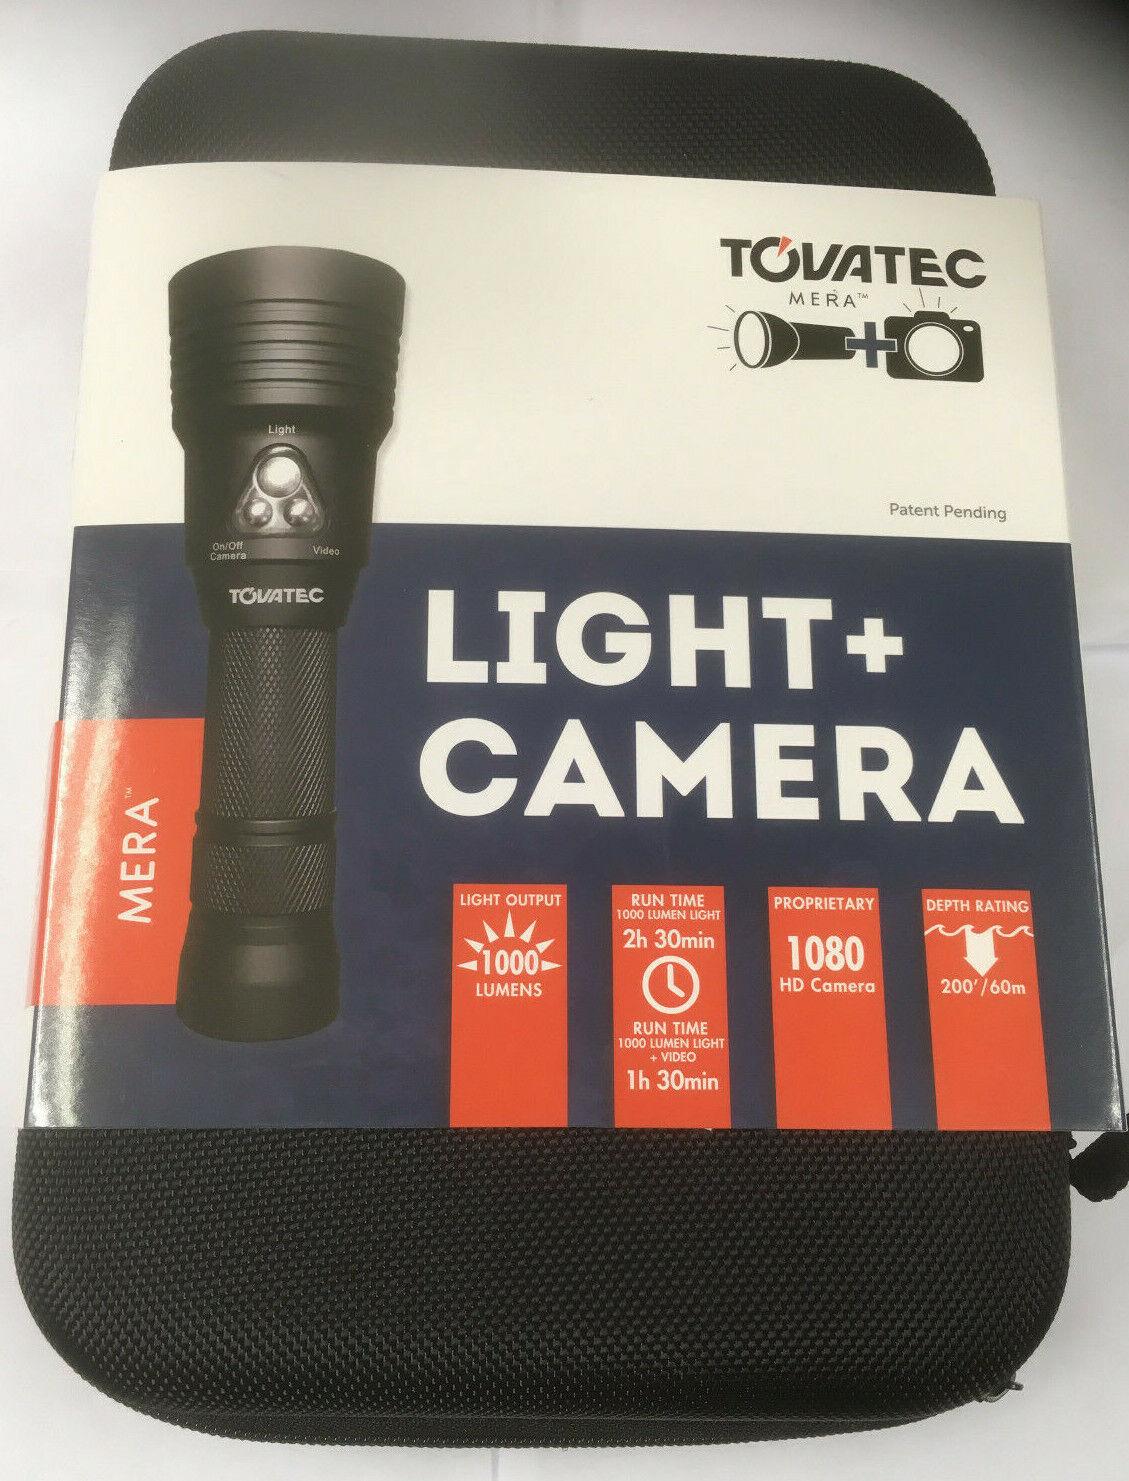 TOVATEC  MERA 1000 LUMENS DIVE LIGHT & BUILT IN HD CAMERA 1080 MP